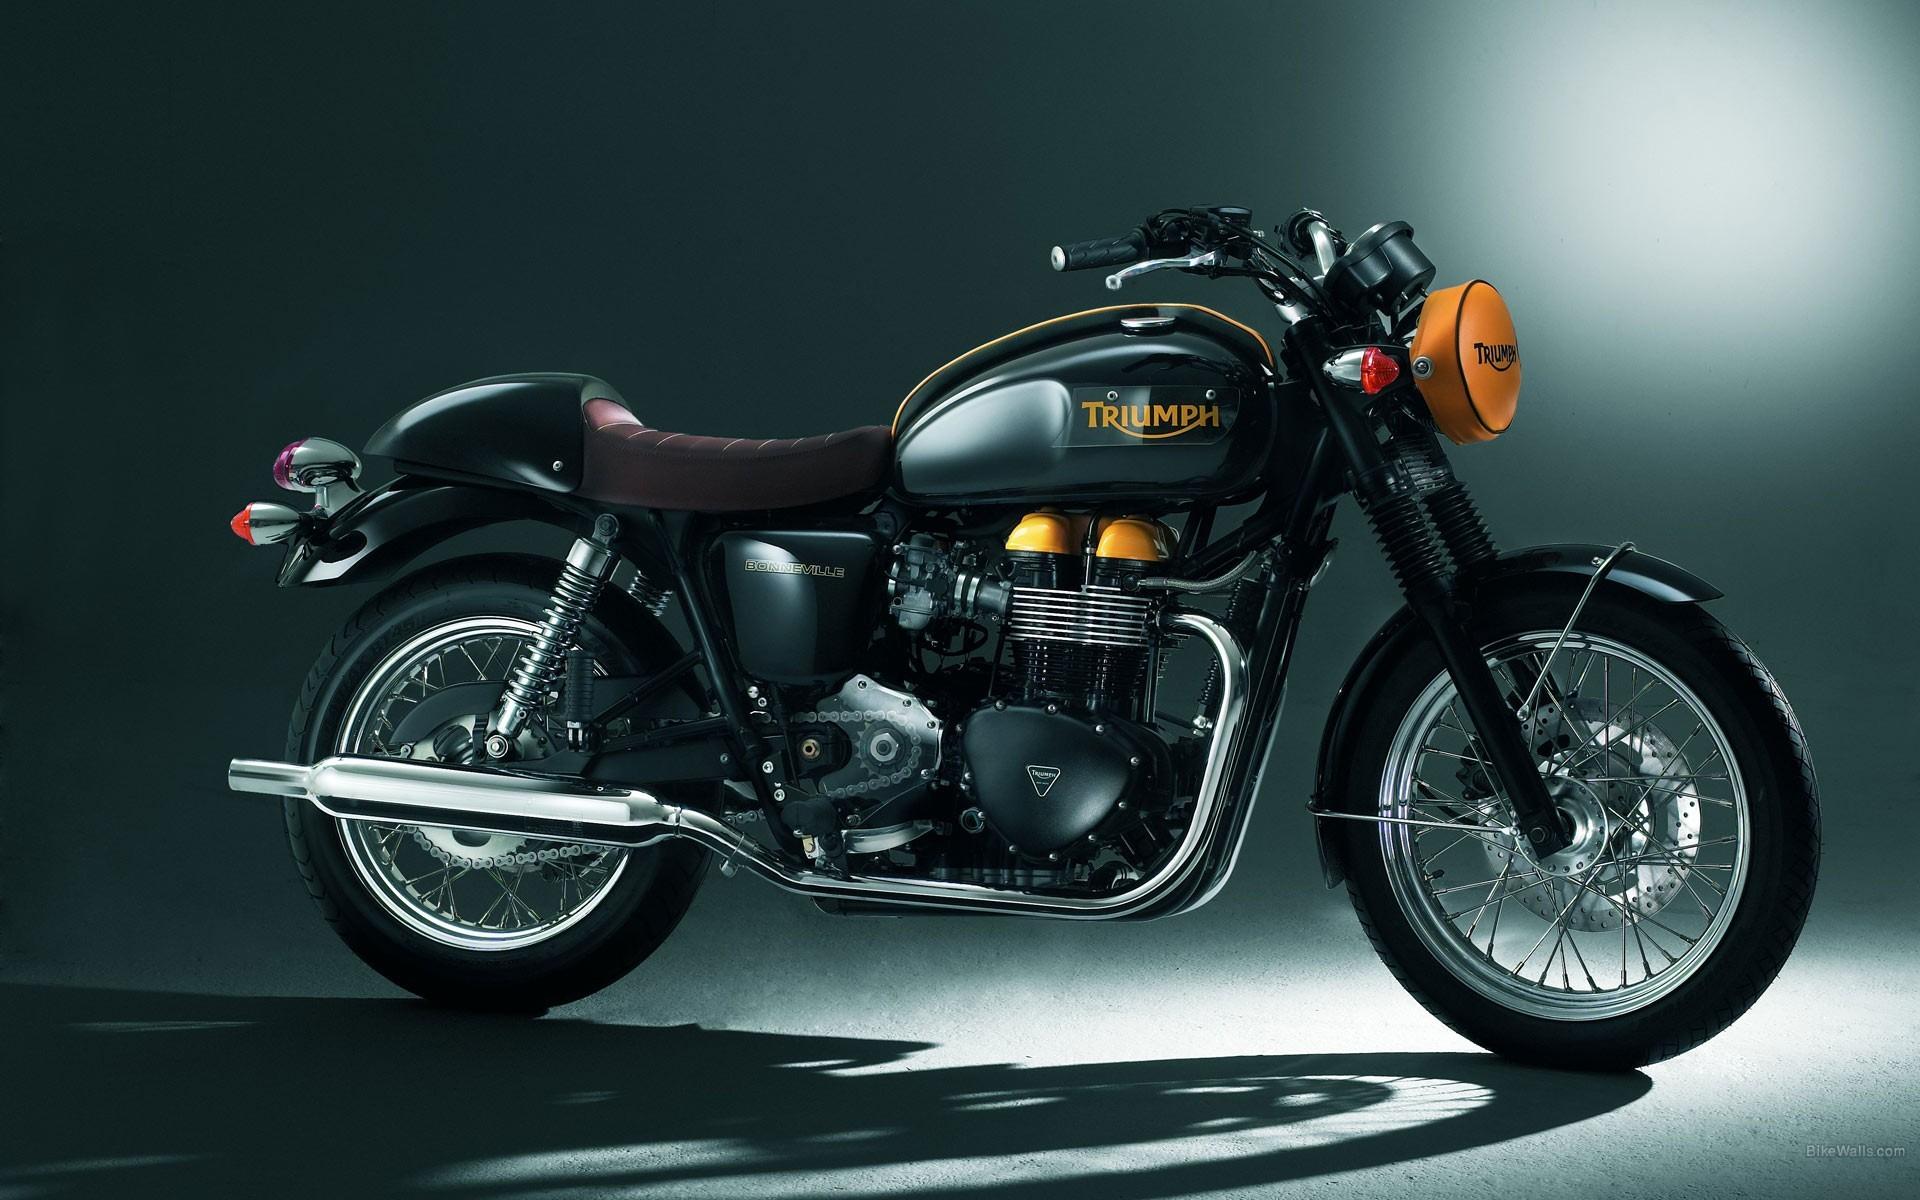 Bike motorbike old classic triumph motorbikes motorbikes cafe racer  wallpaper     8913   WallpaperUP